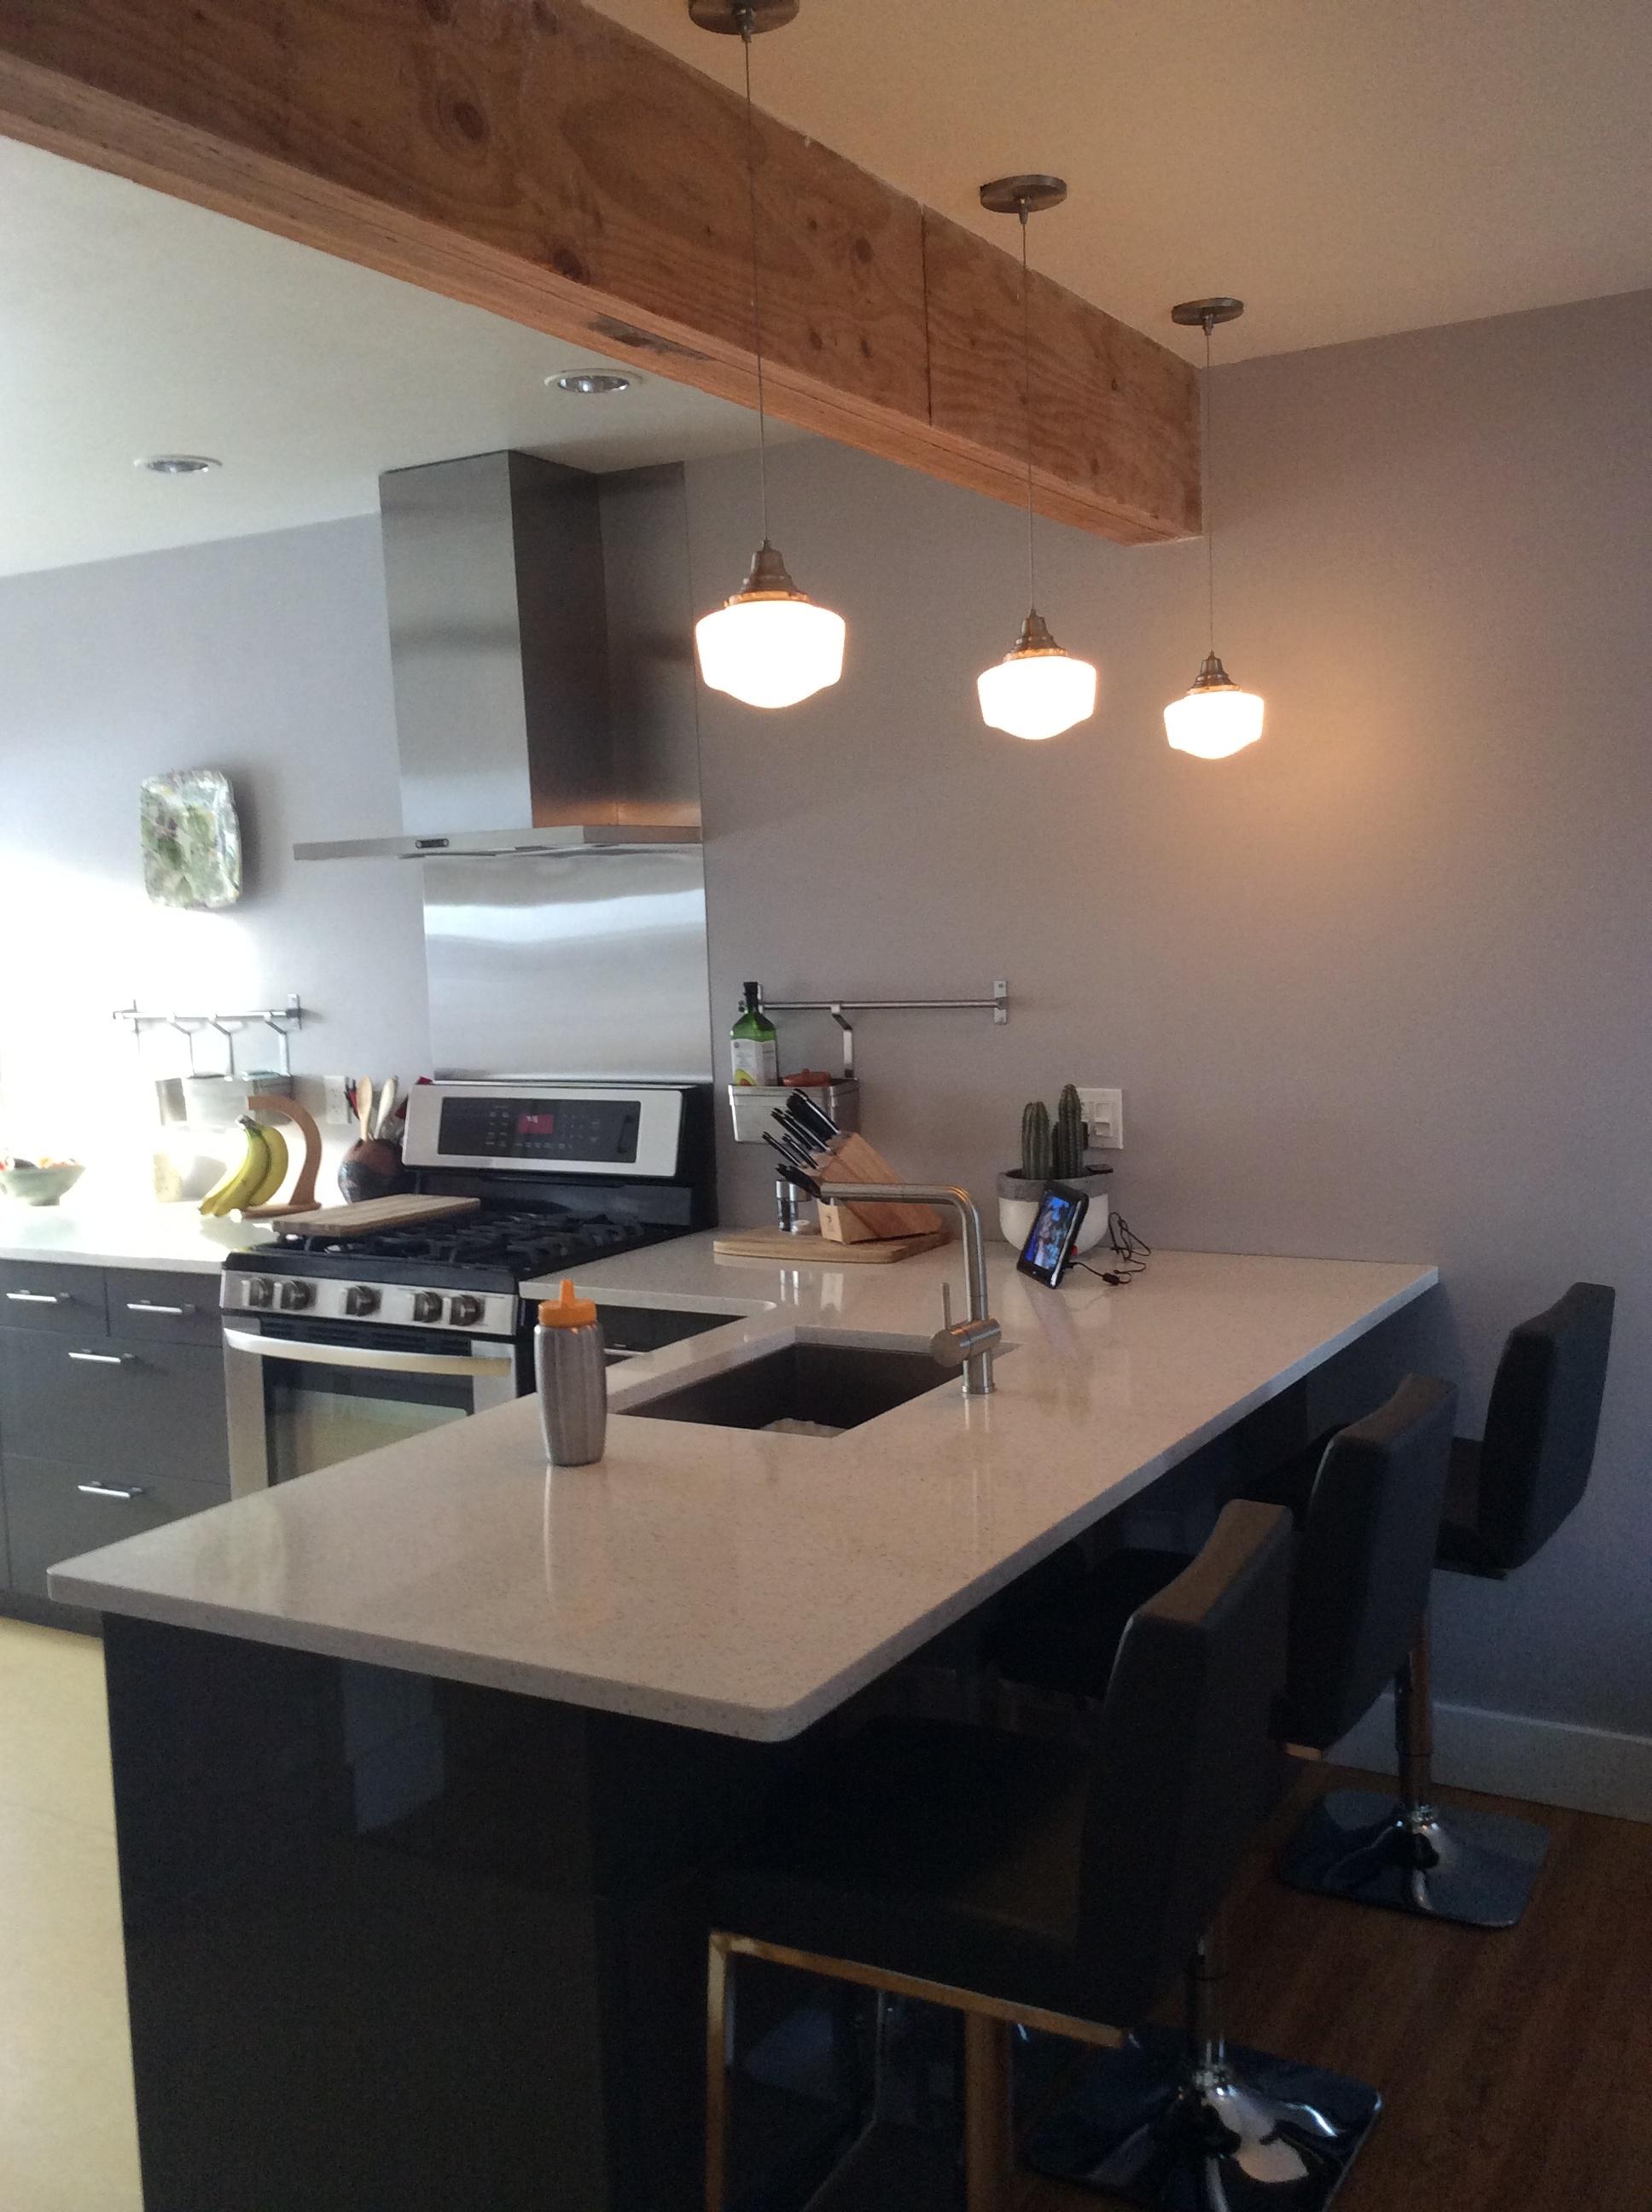 Schoolhouse pendant light fixtures, quartz countertops, Ikea cabinets, rustic support beam.